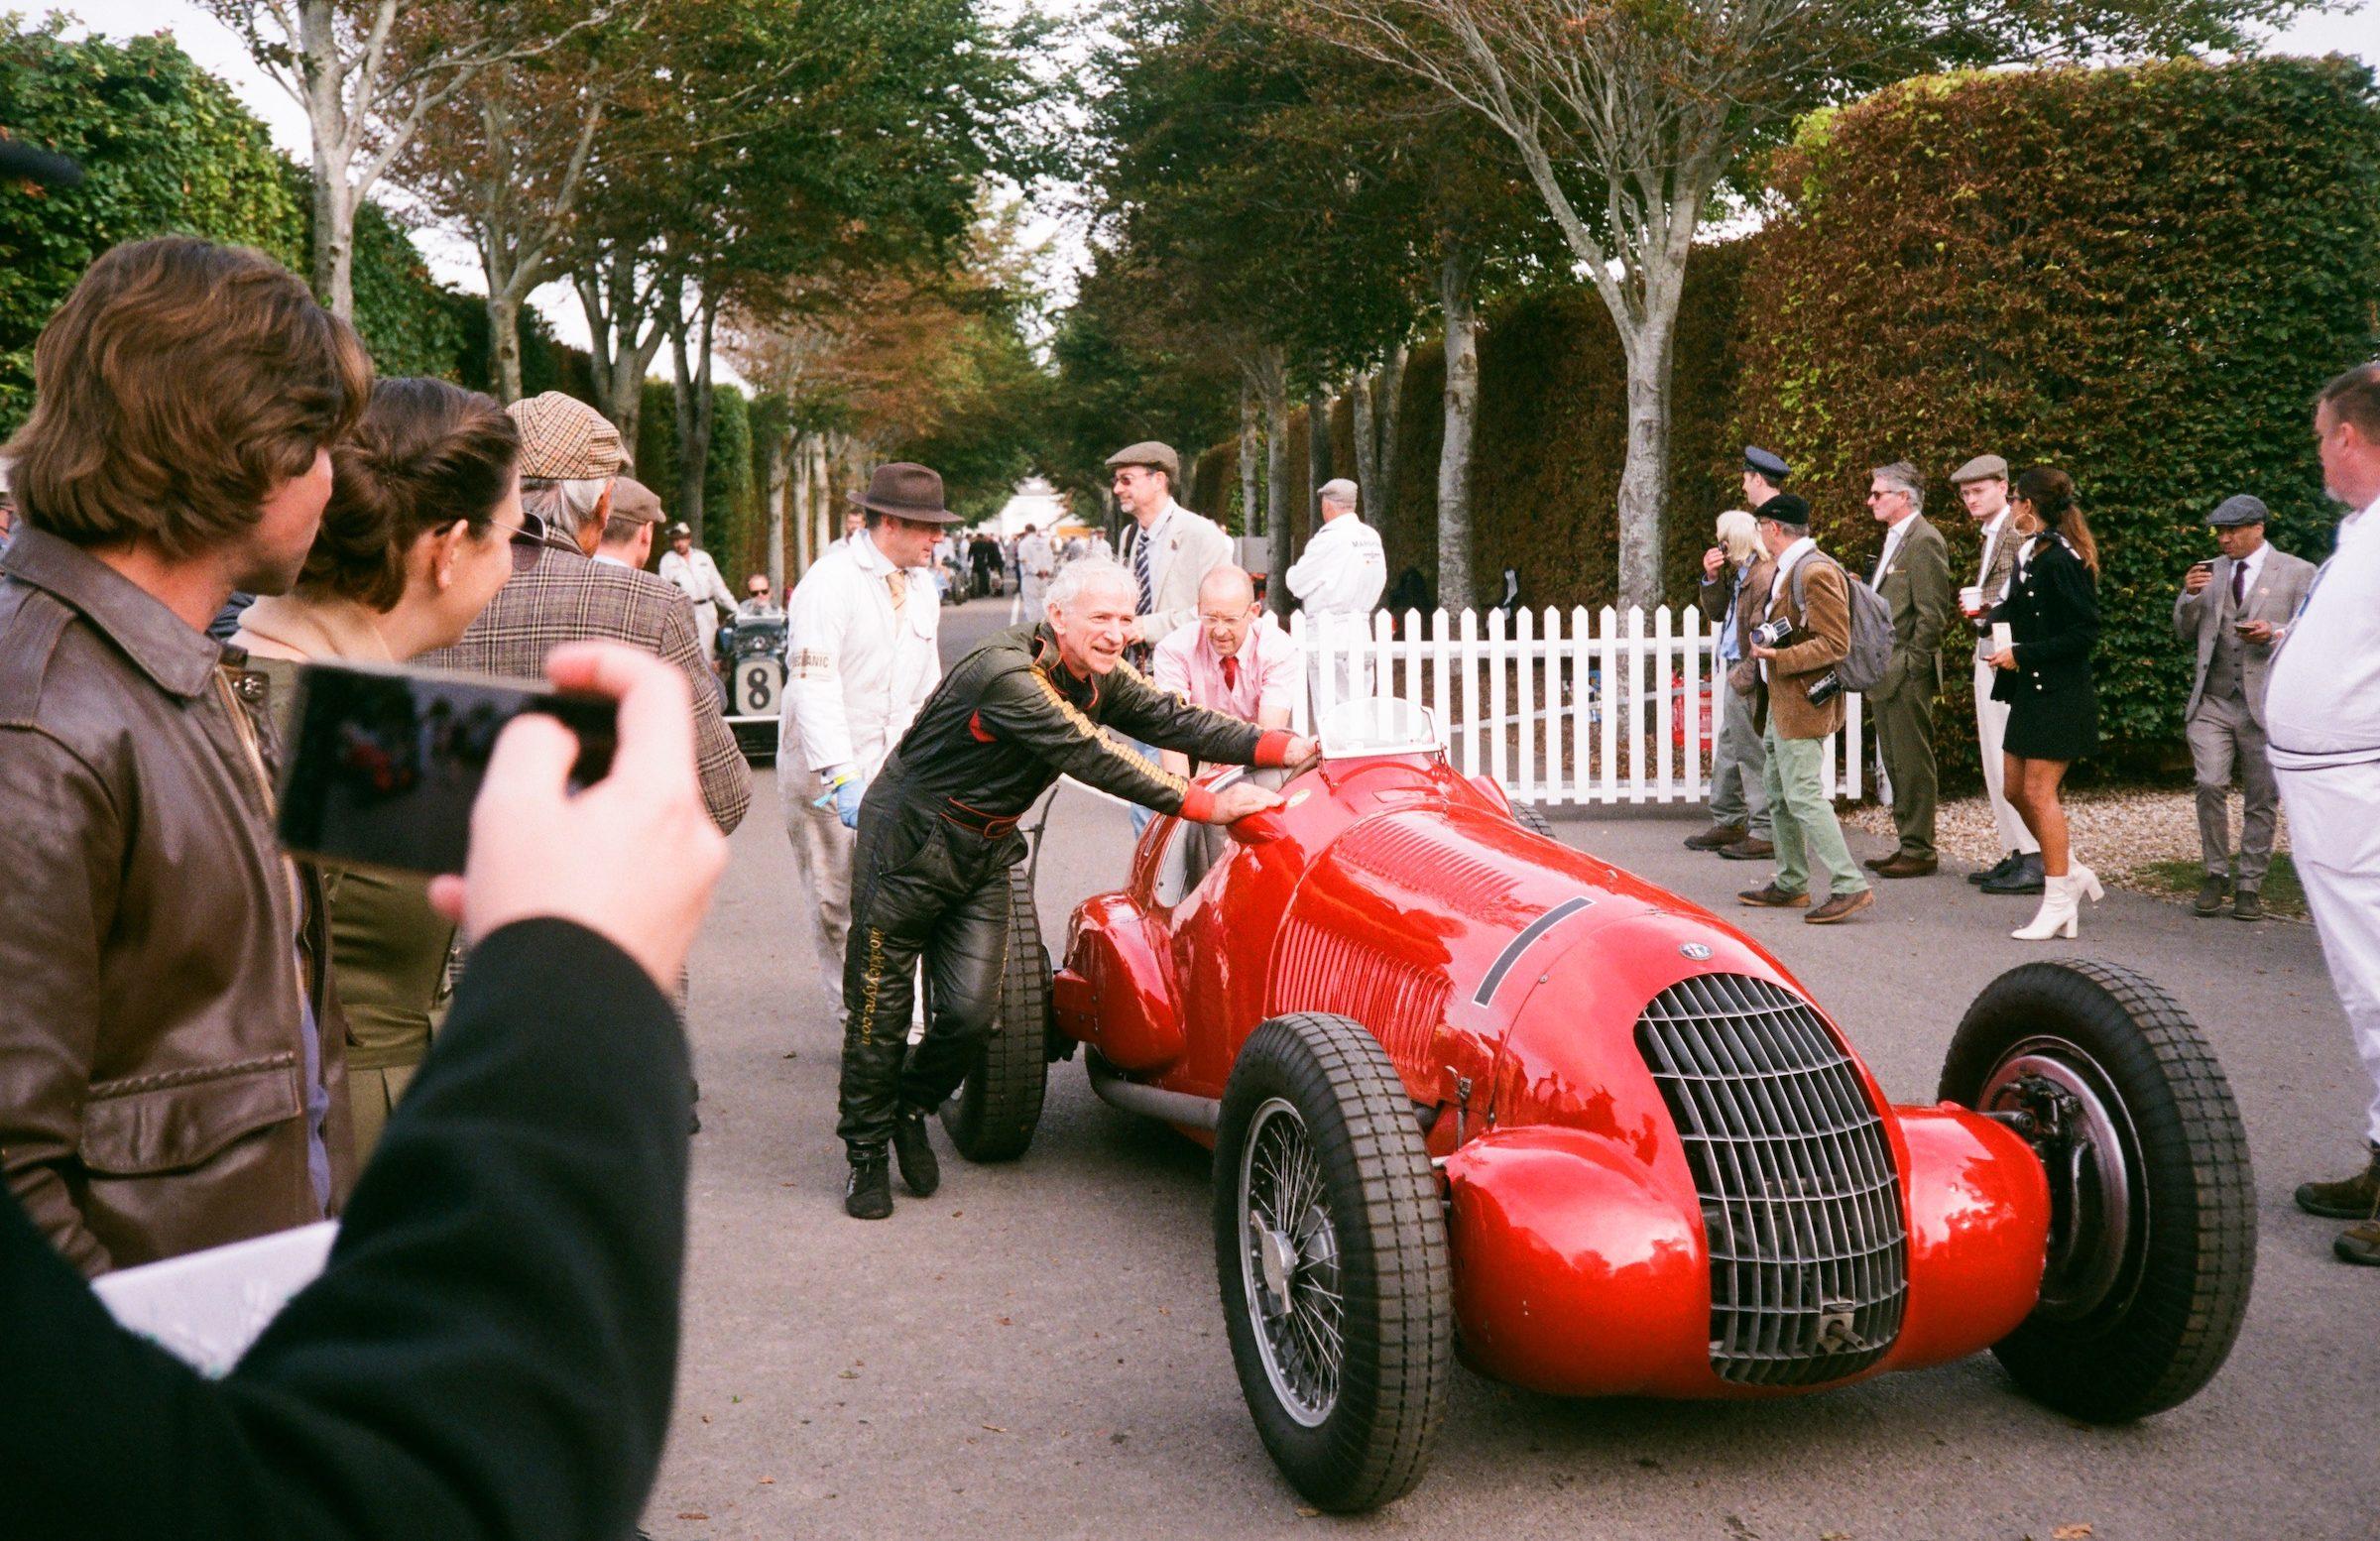 Goodwood Revival film open wheel vintage racer